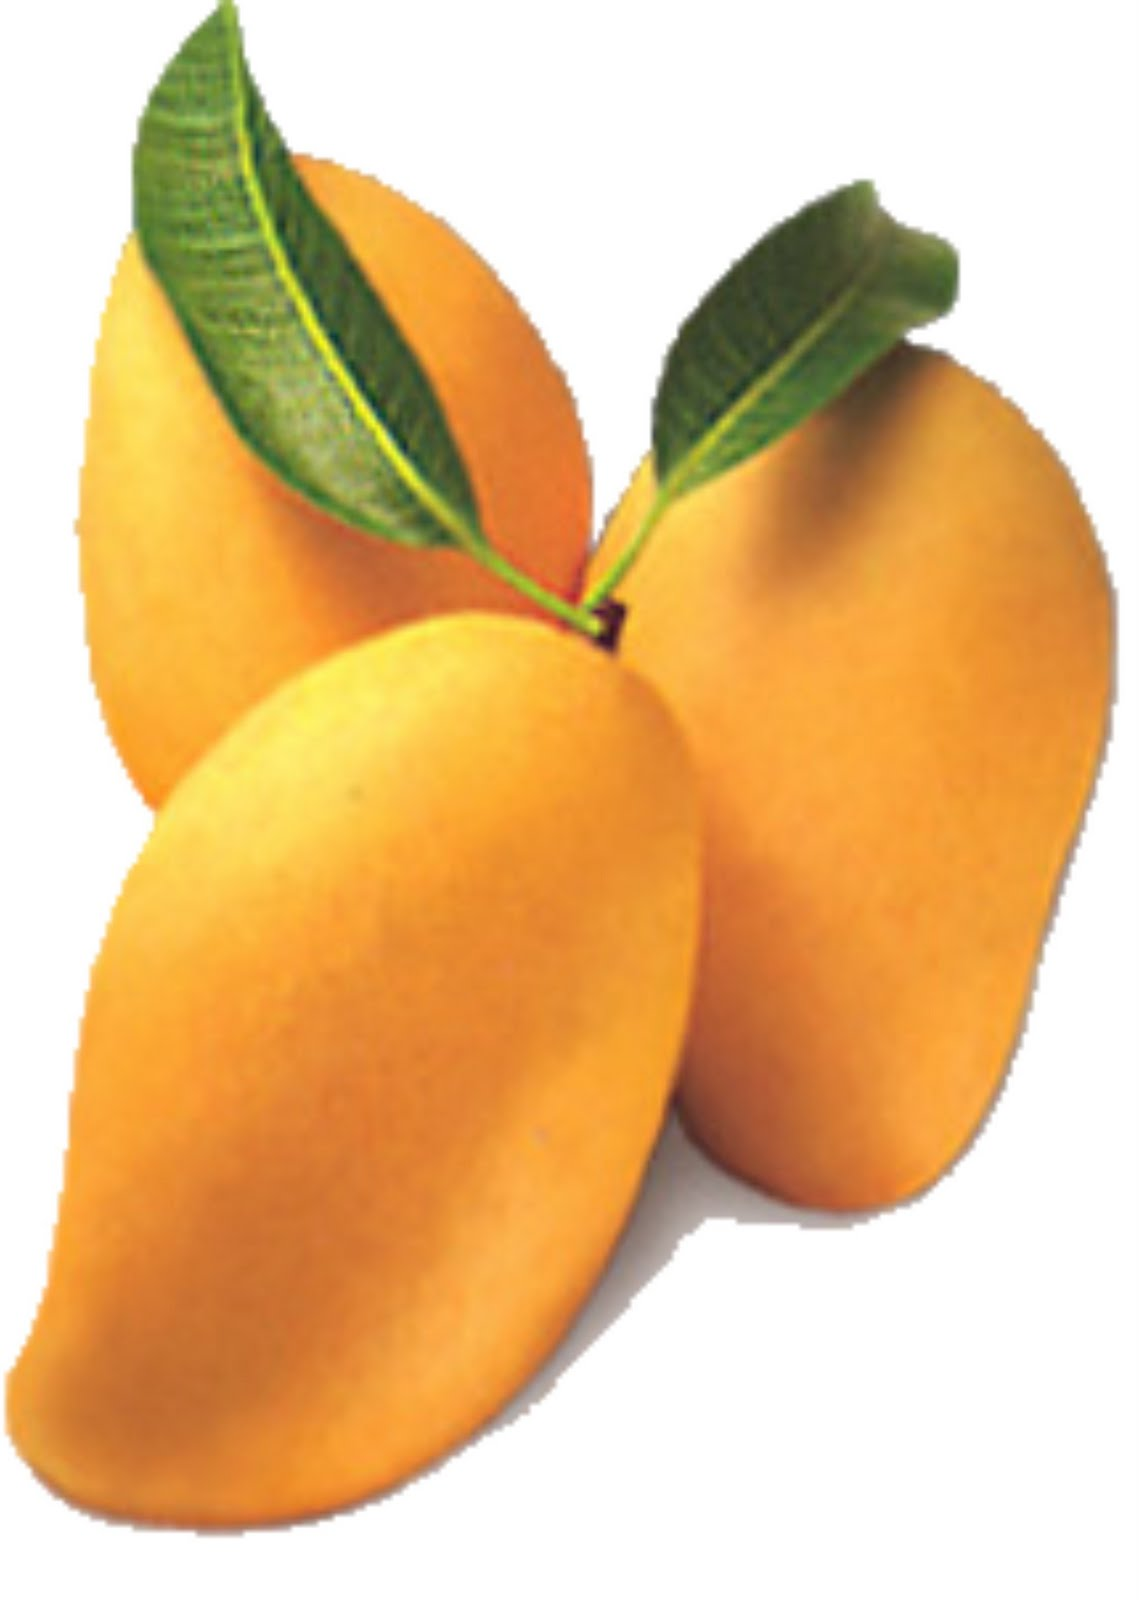 flower induction in carabao mango